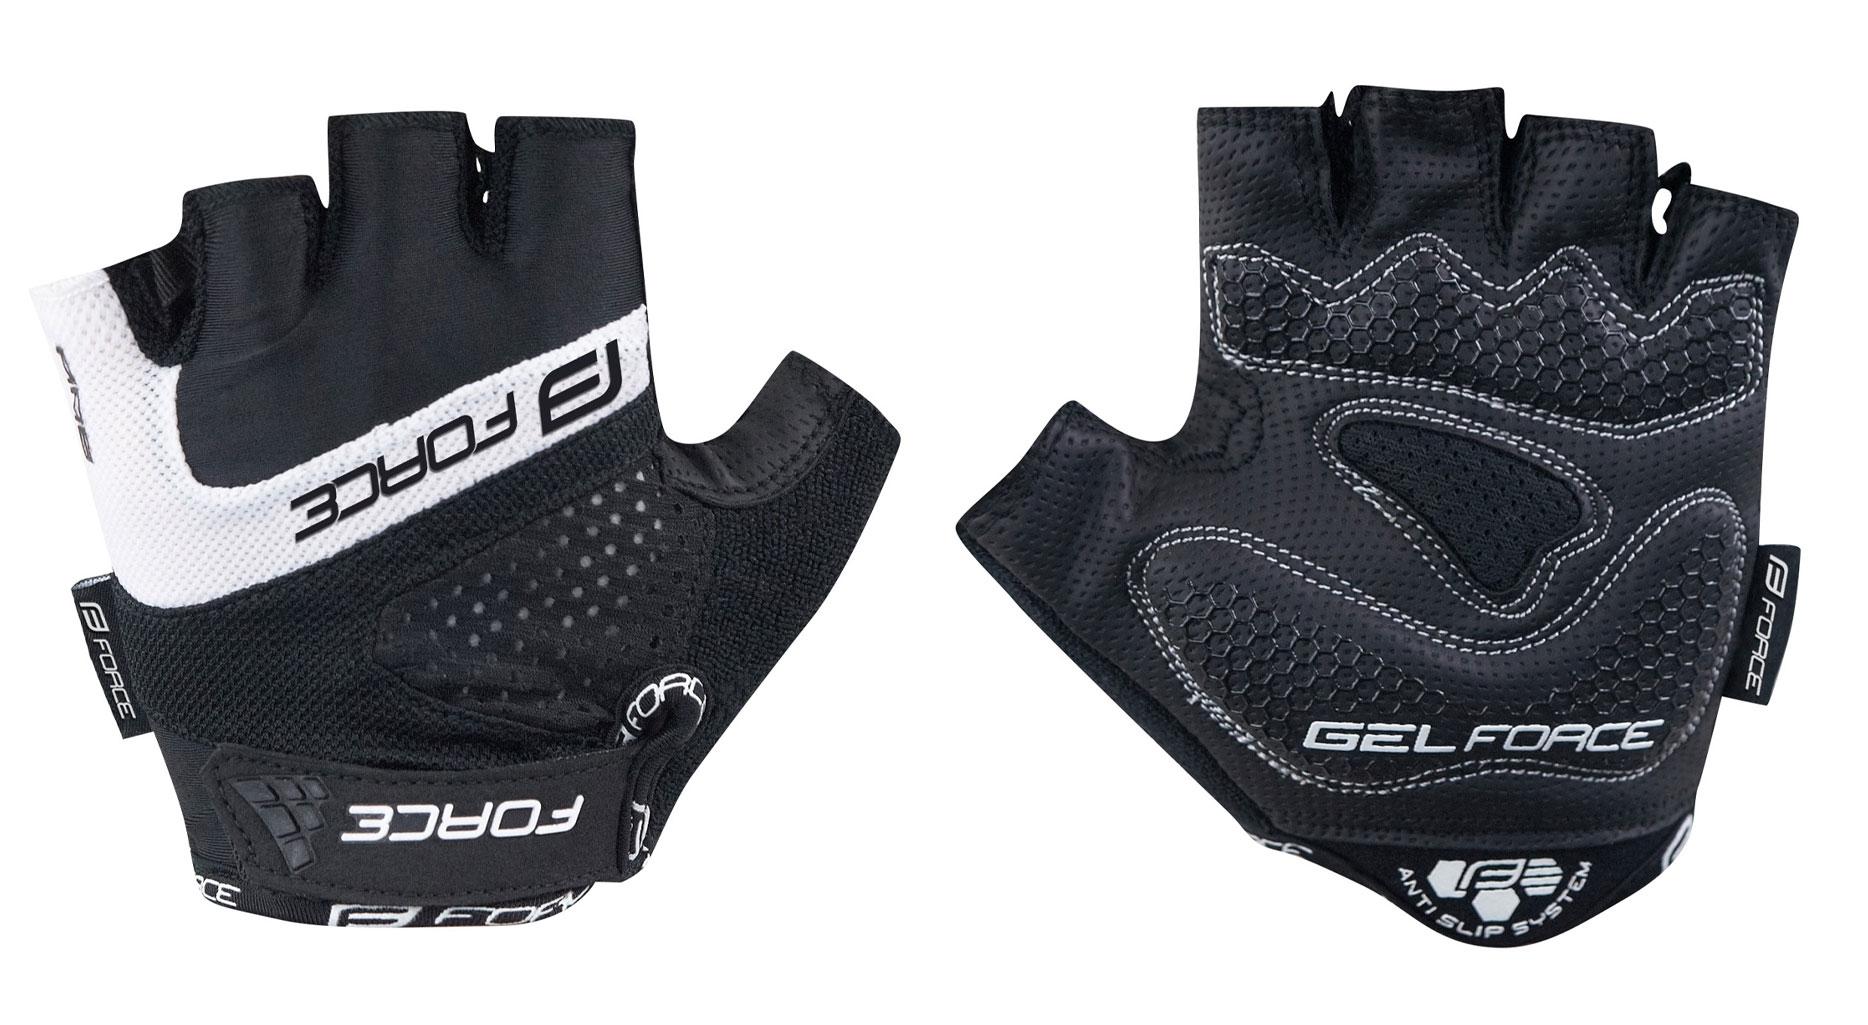 rukavice FORCE RAB gel, černé XL